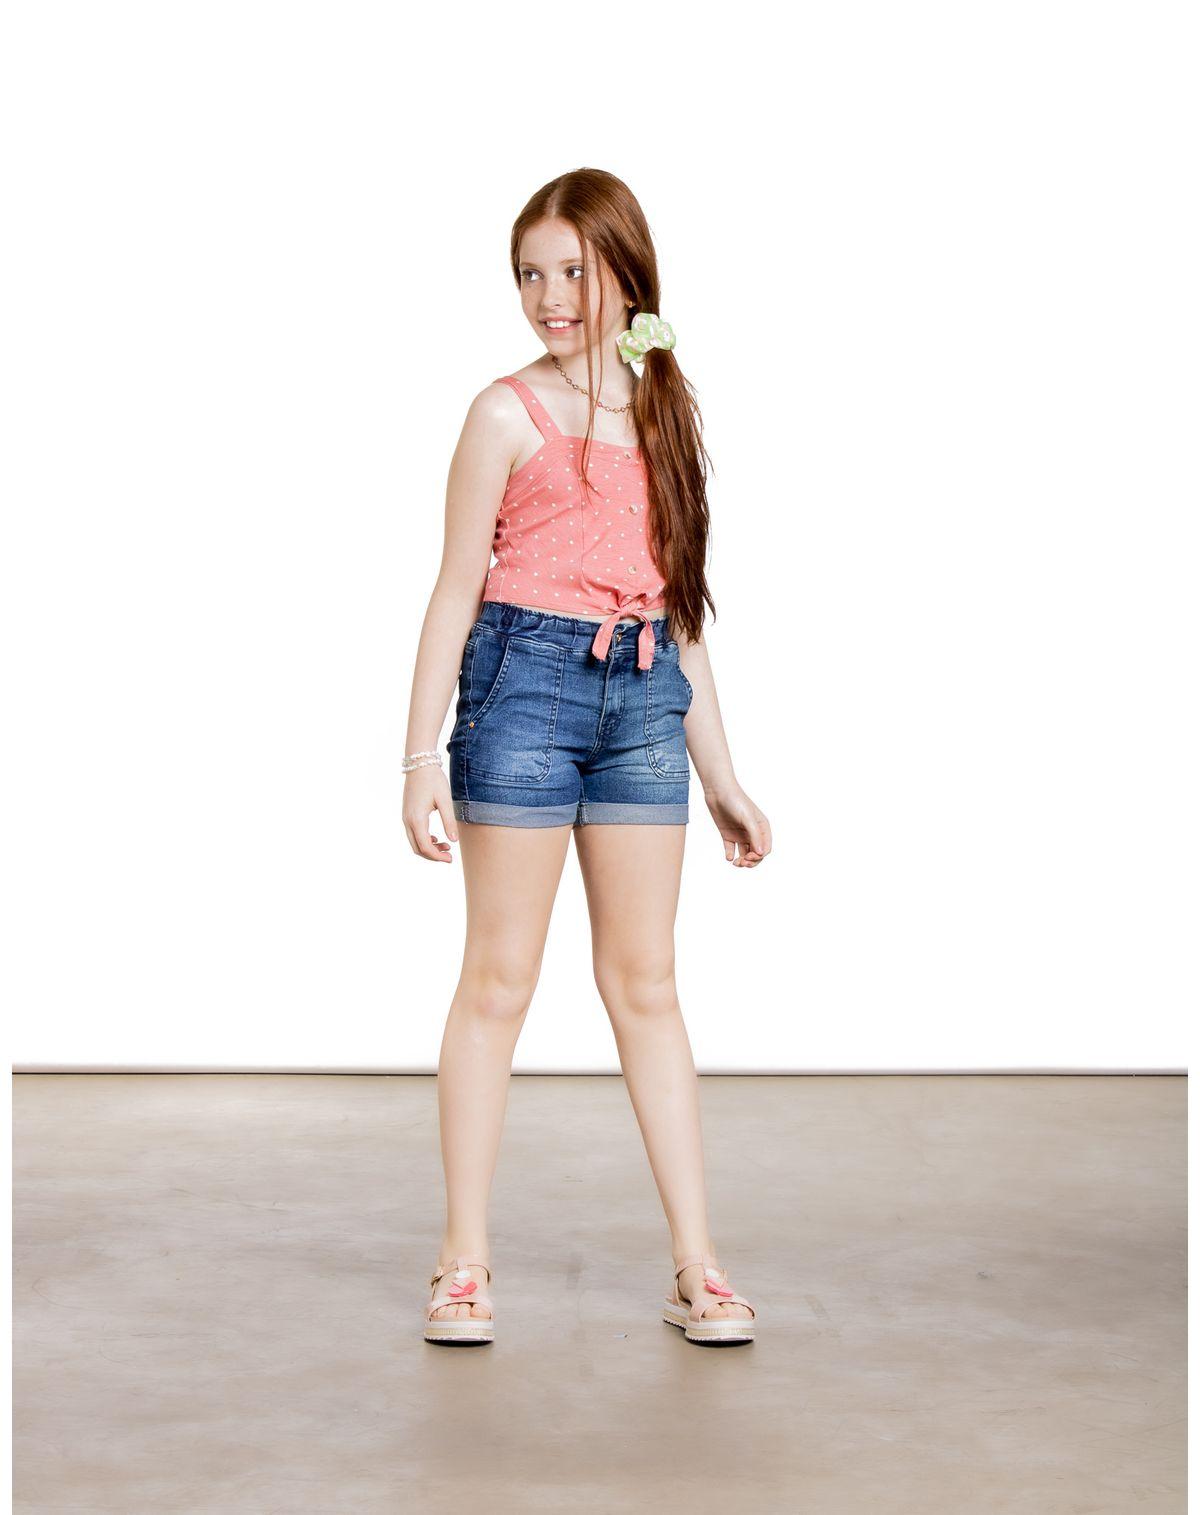 567835002-short-jeans-juvenil-menina-barra-dobrada-jeans-12-741